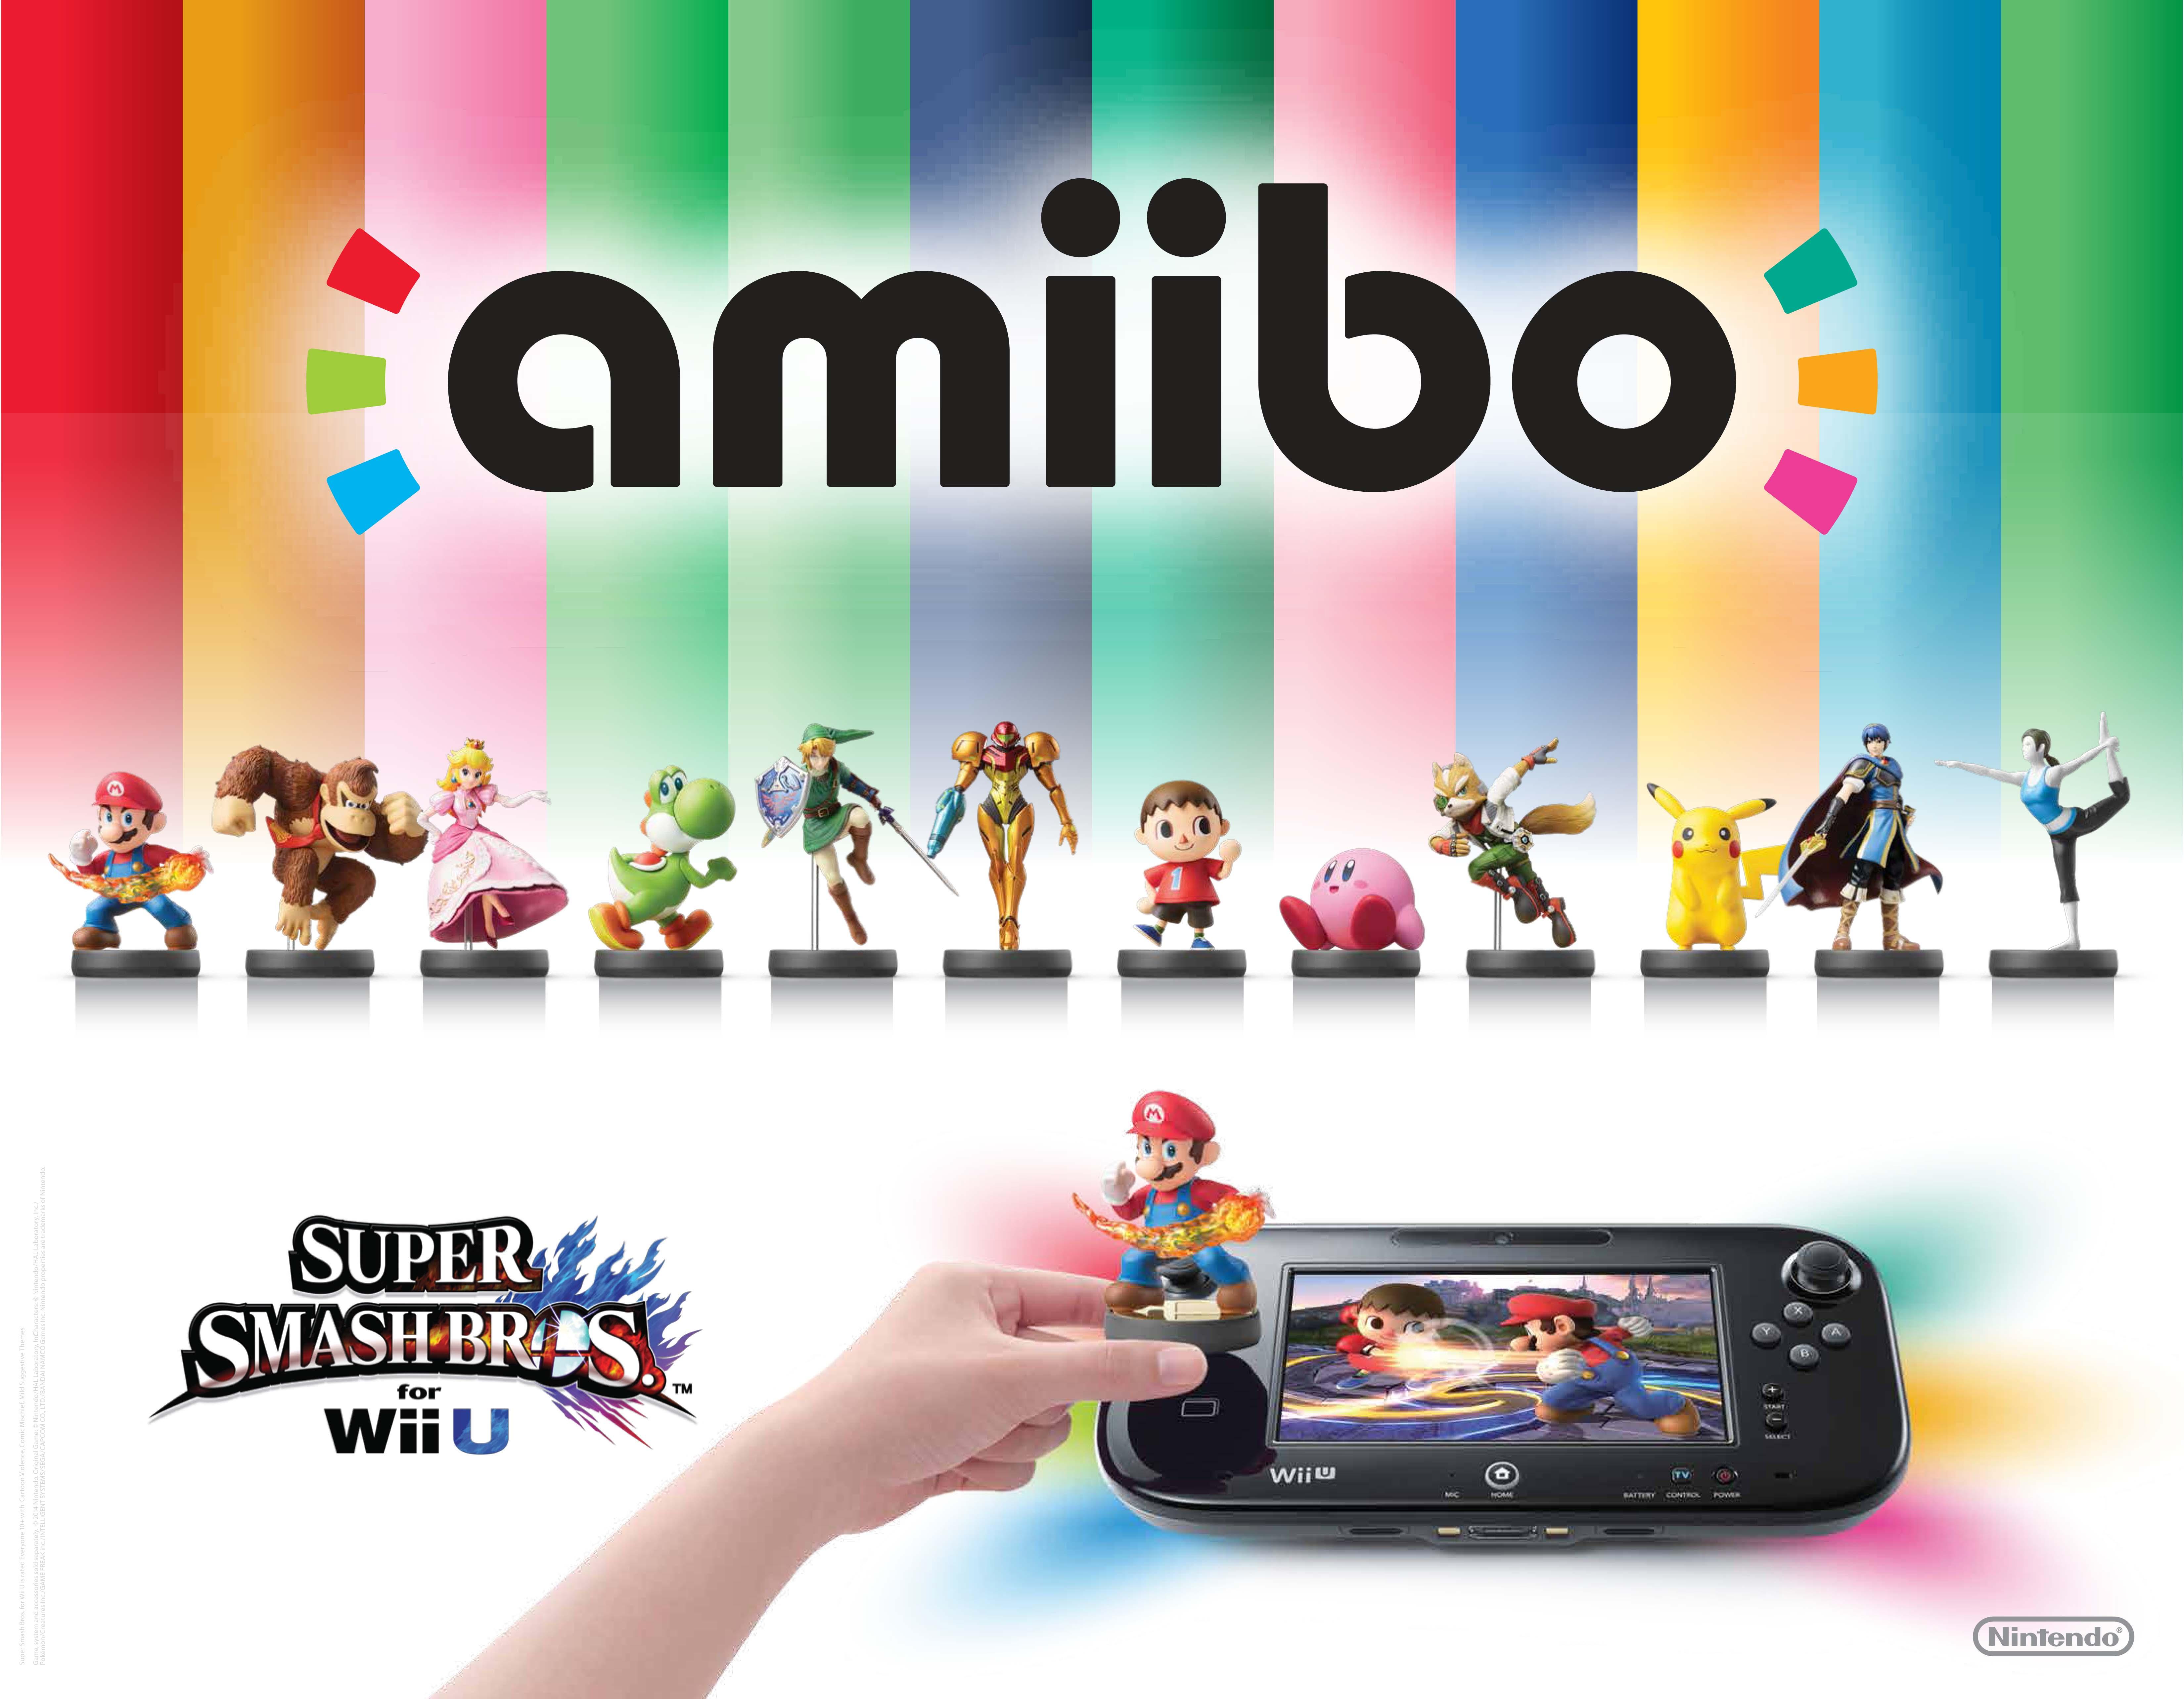 Nintendo's Amiibo Toys Will Sell for $13 Each; $300 Mario Kart 8 Wii U Bundle Announced